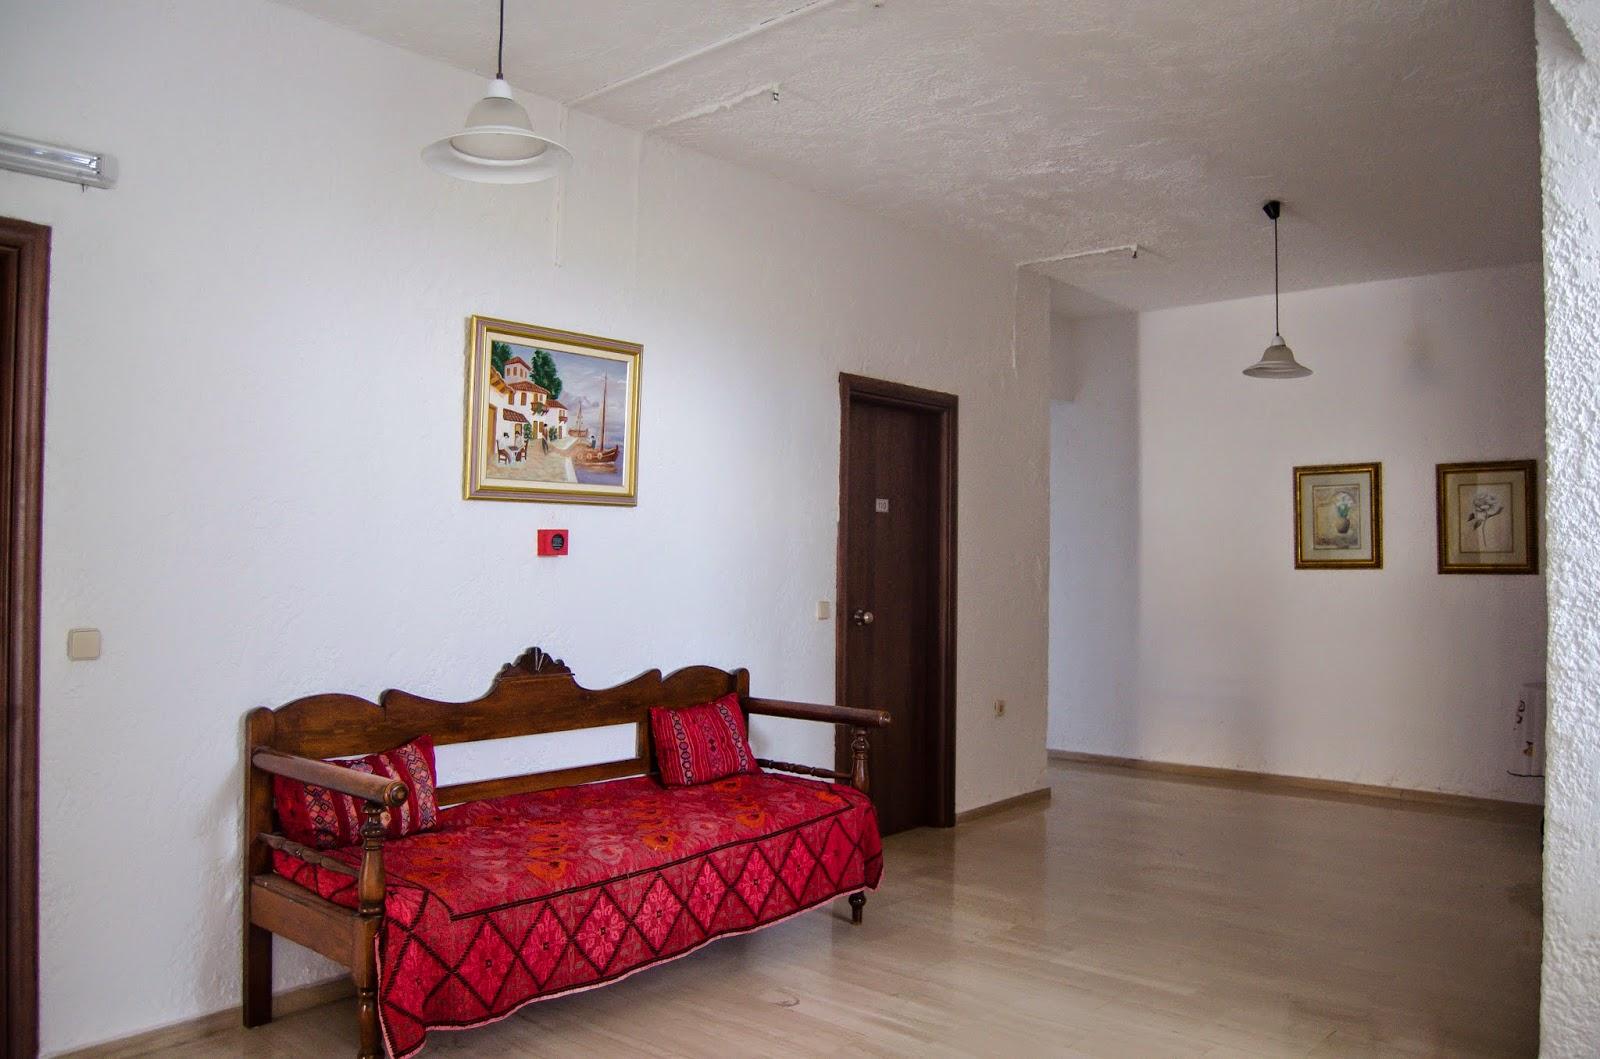 Отель Сторк (Hotel Stork) 3*